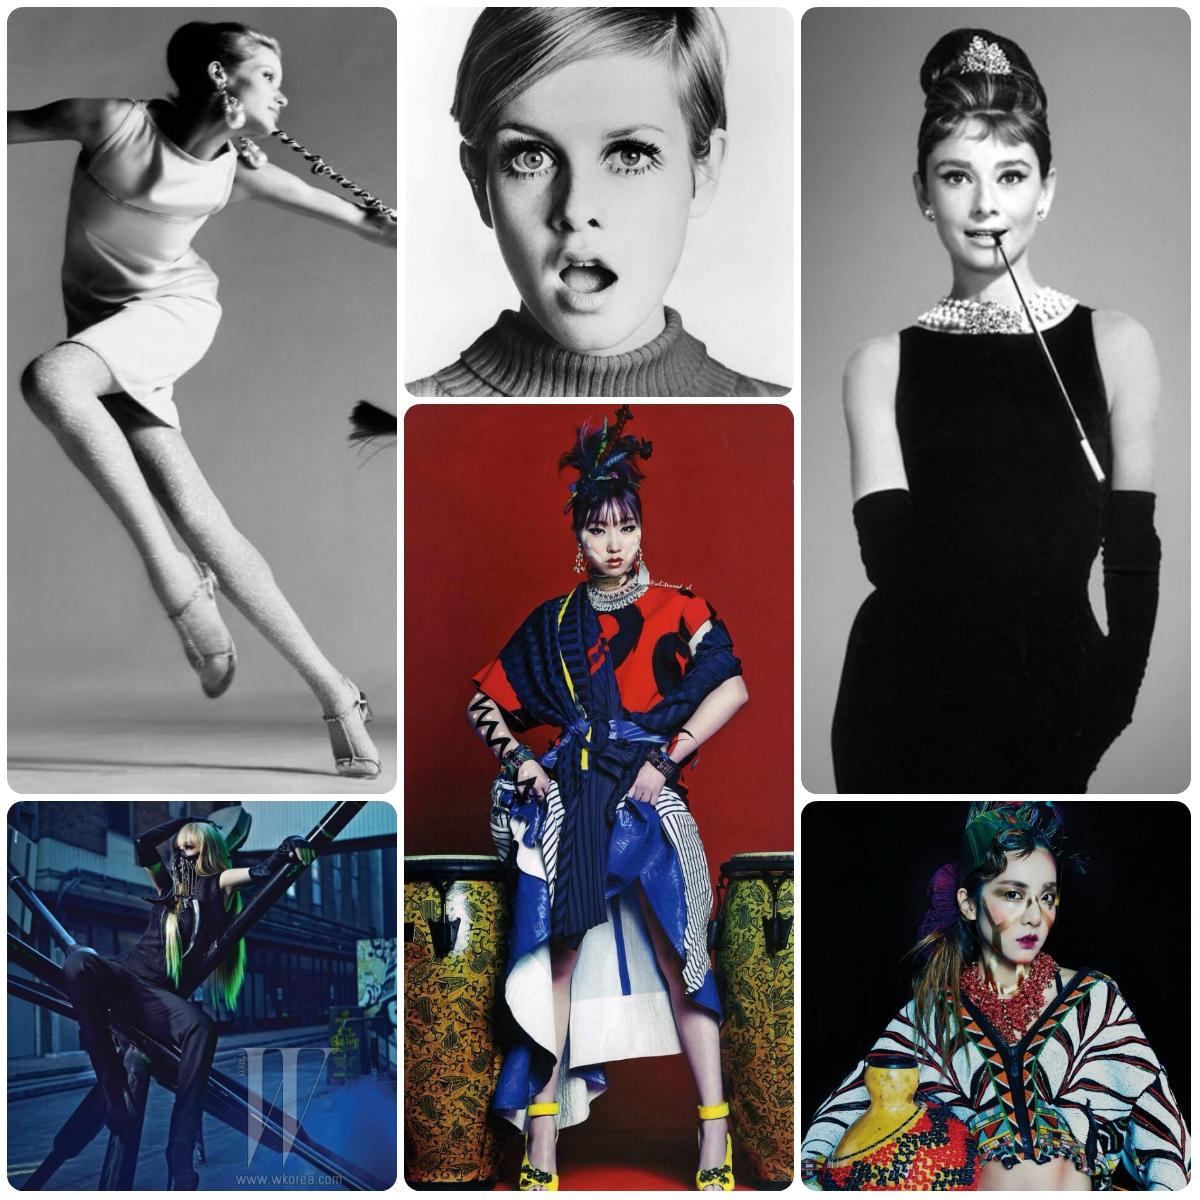 Lecture by Bogdan Semyonov on fashion photography